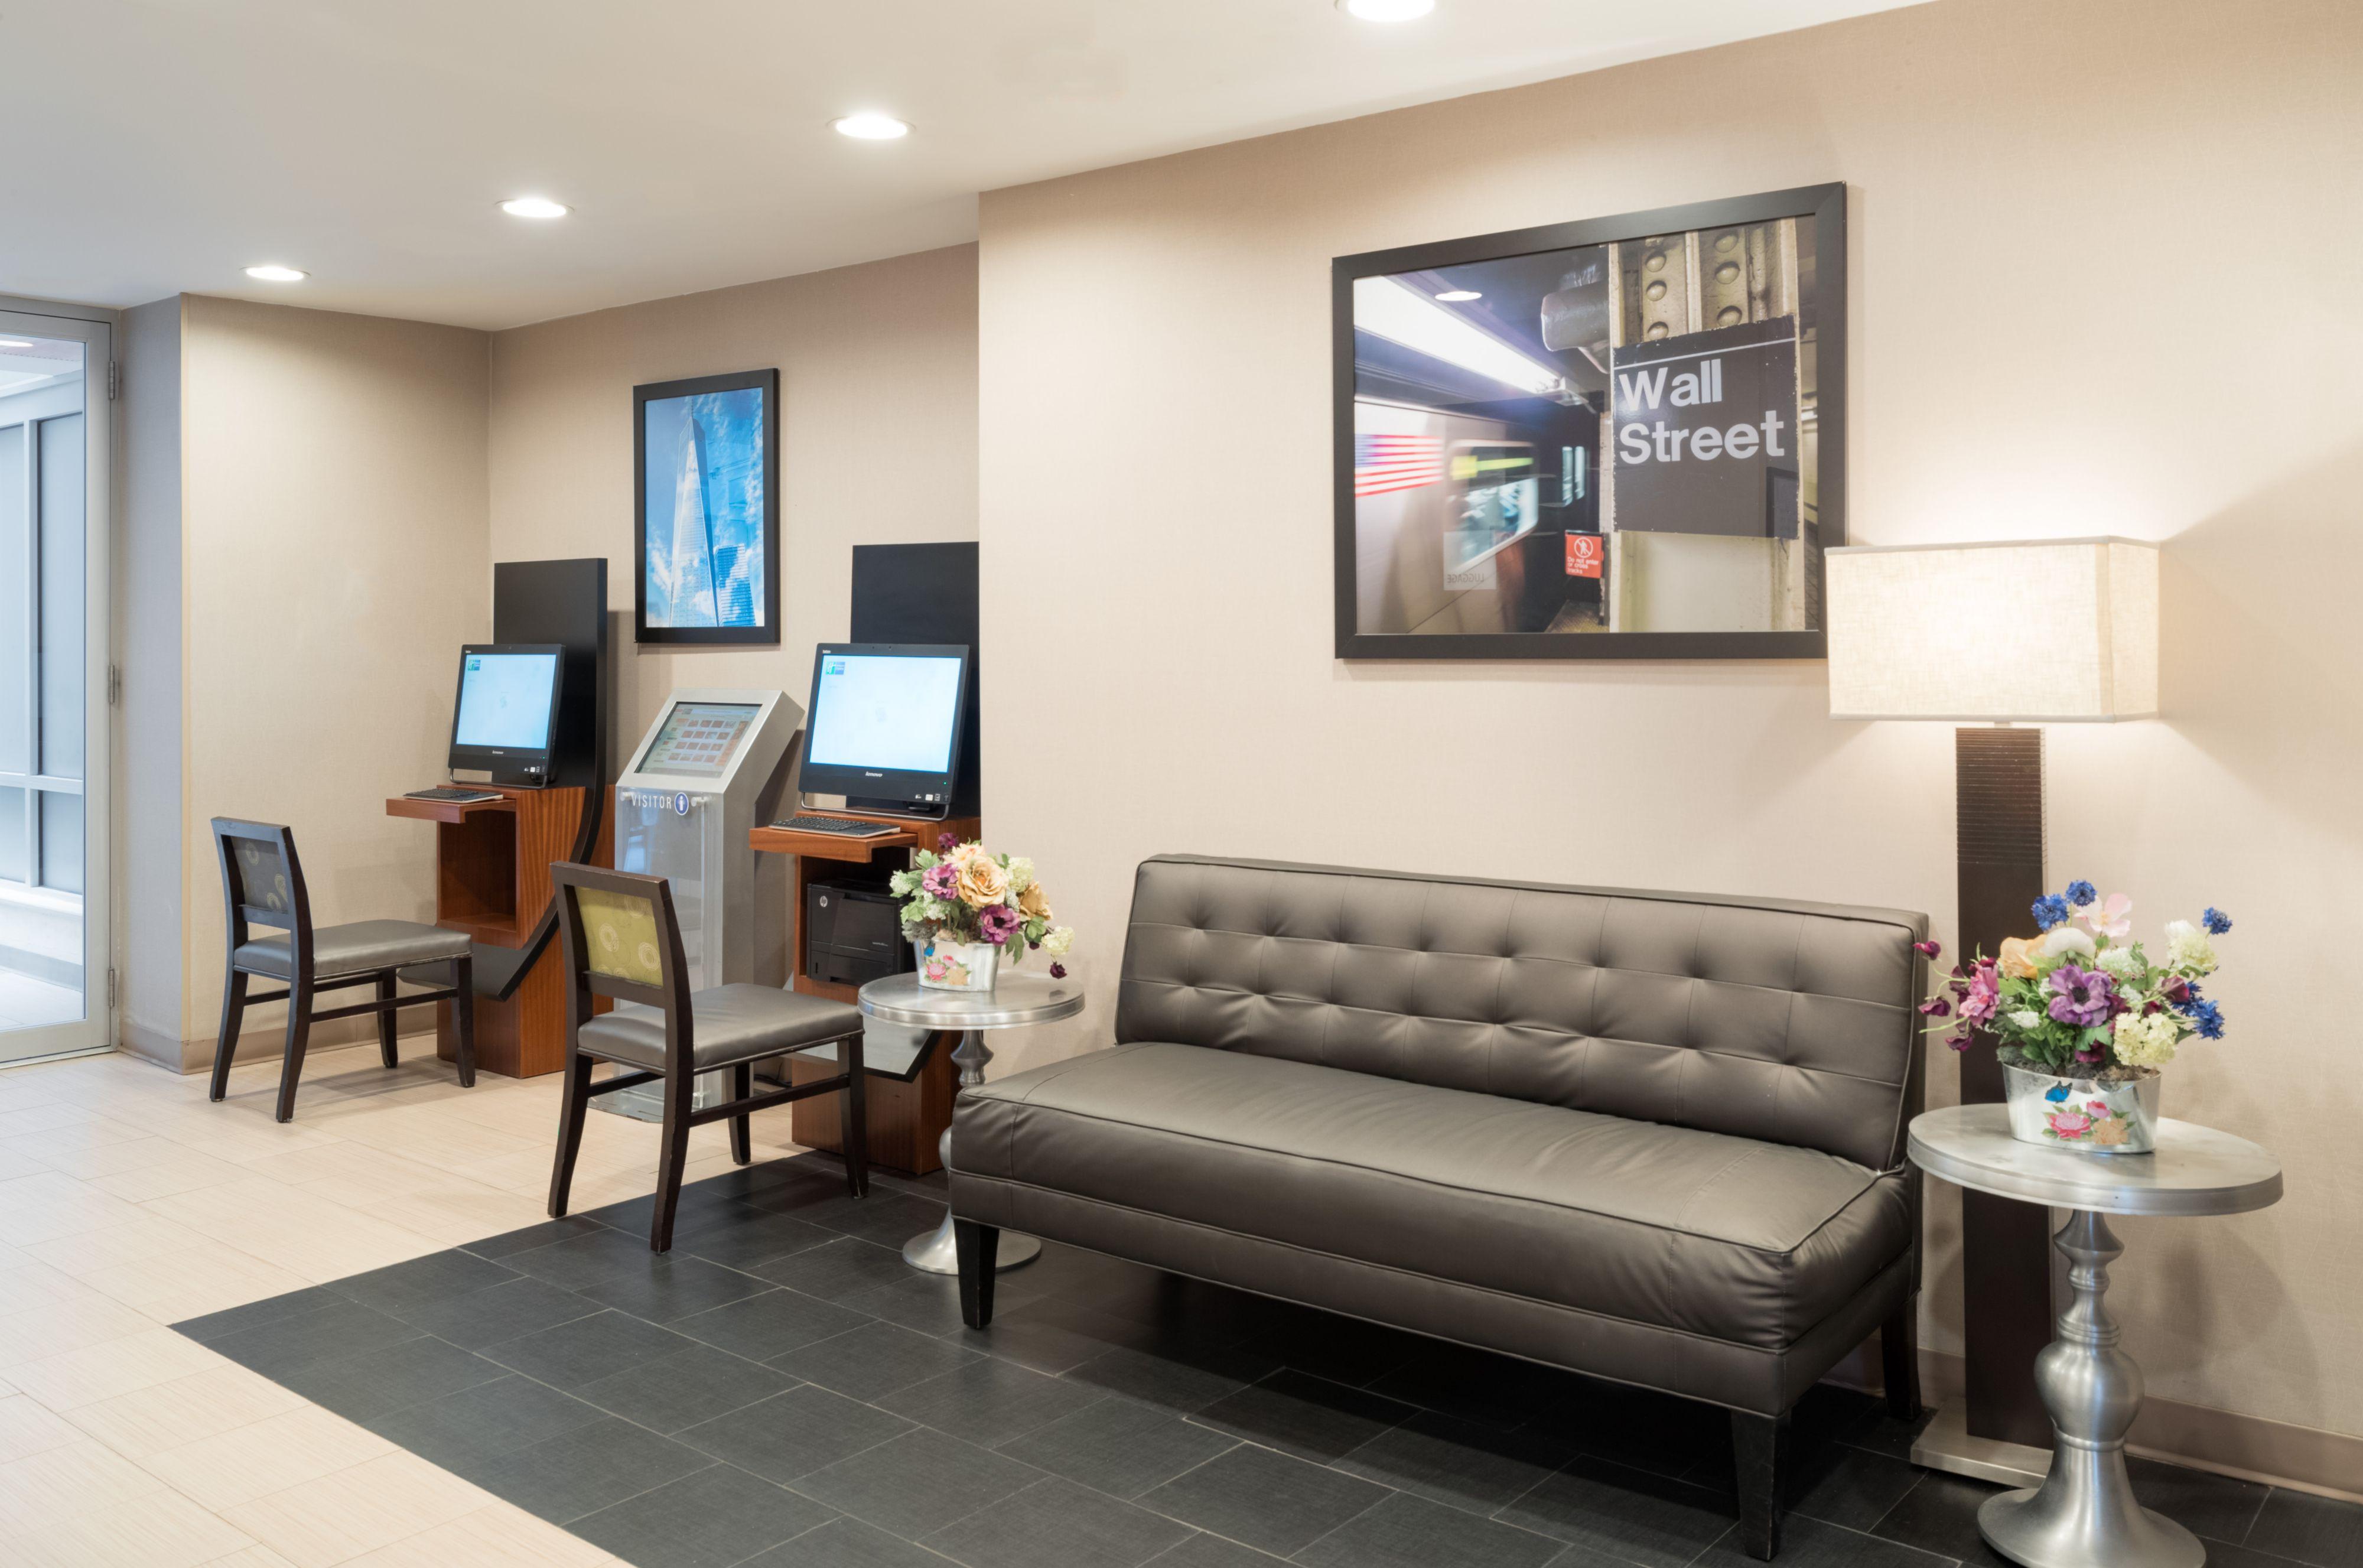 Holiday Inn Express New York City-Wall Street image 4